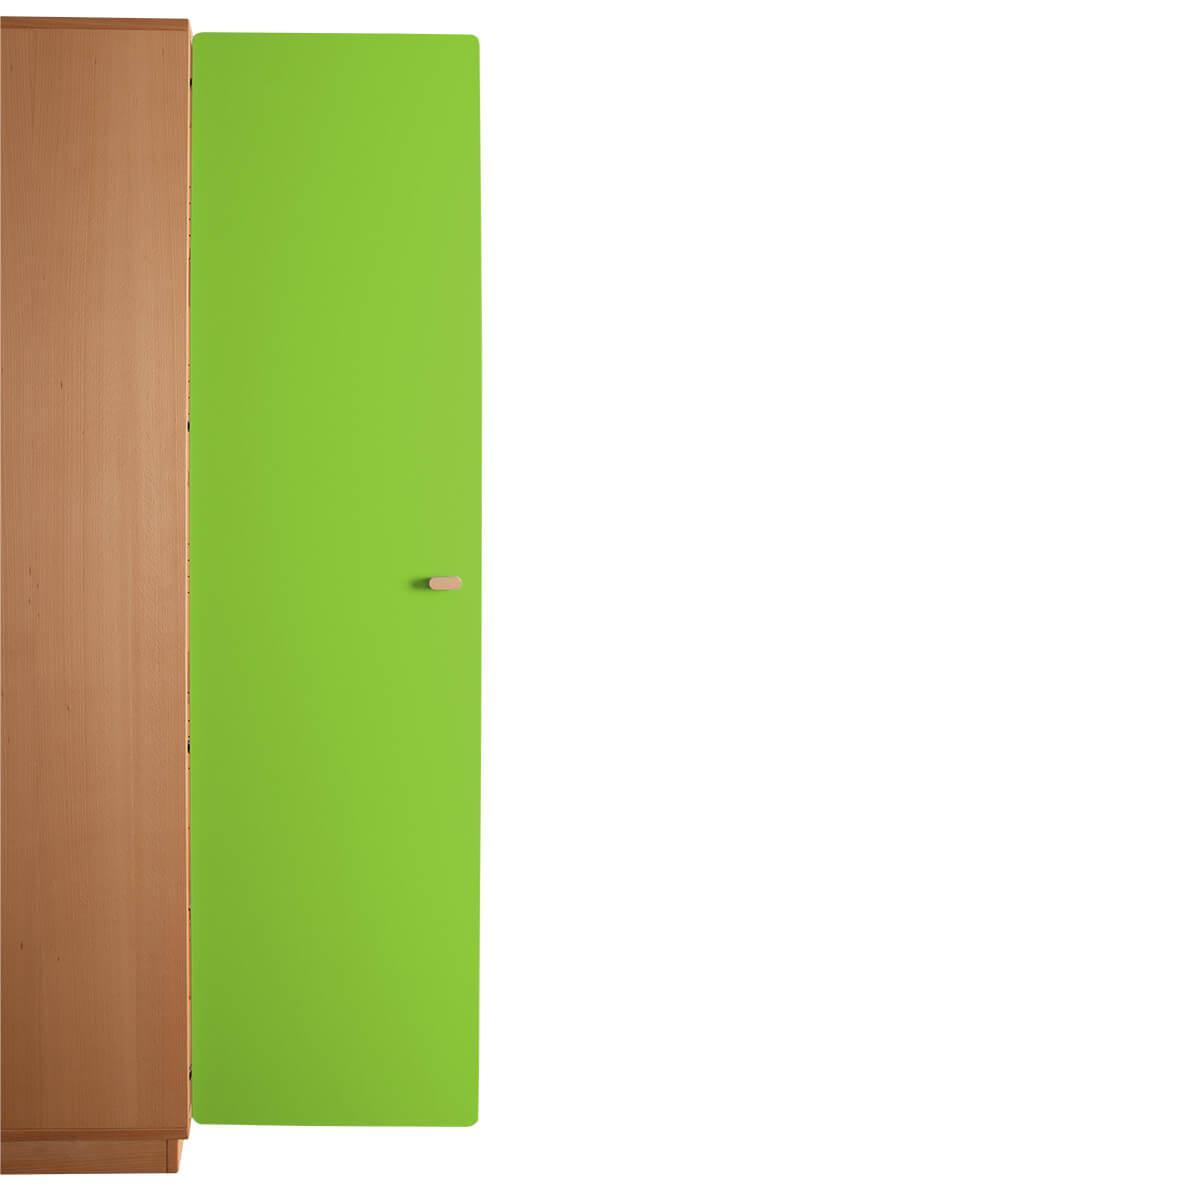 Schranktür 5/5 176cm-Griff DESTYLE Debreuyn  MDF lindgrün-lackiert